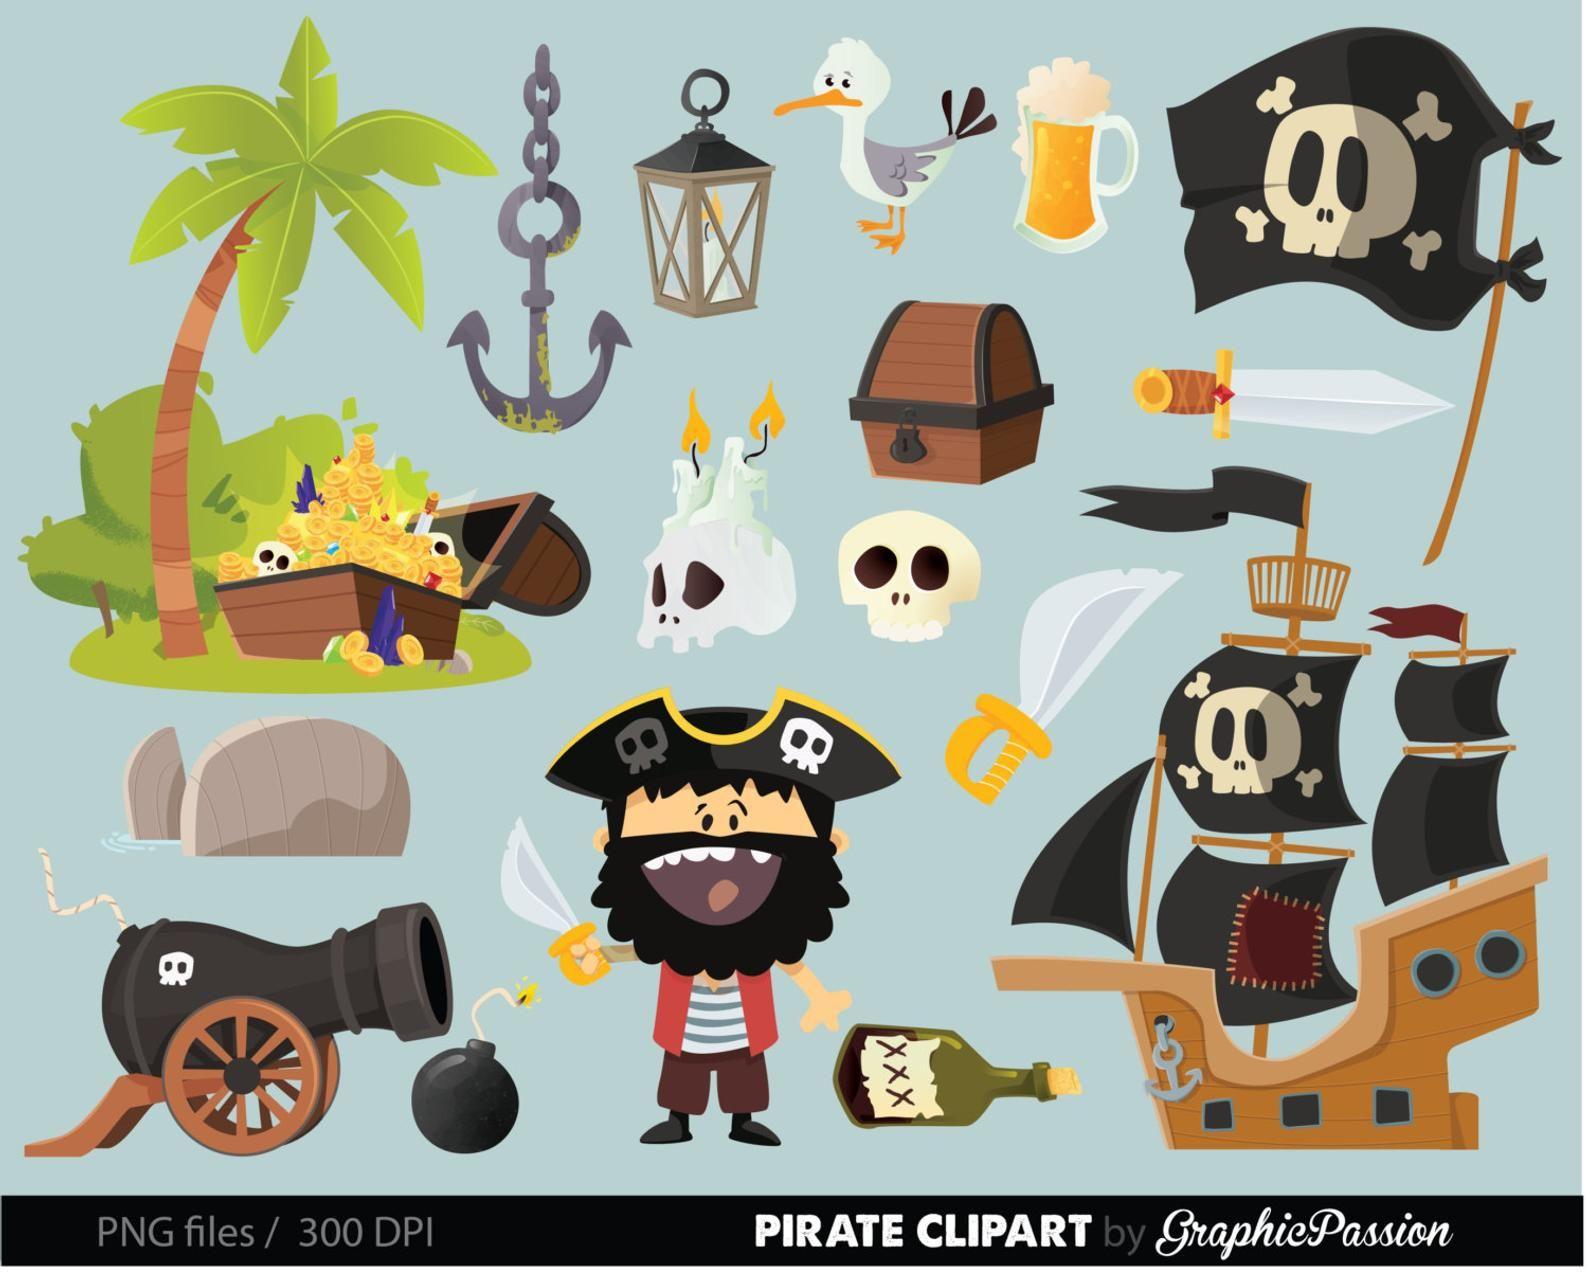 Pirate ship flag clipart clip transparent Pirate clip art Pirate ship clipart Treasure Nautical Anchor ... clip transparent